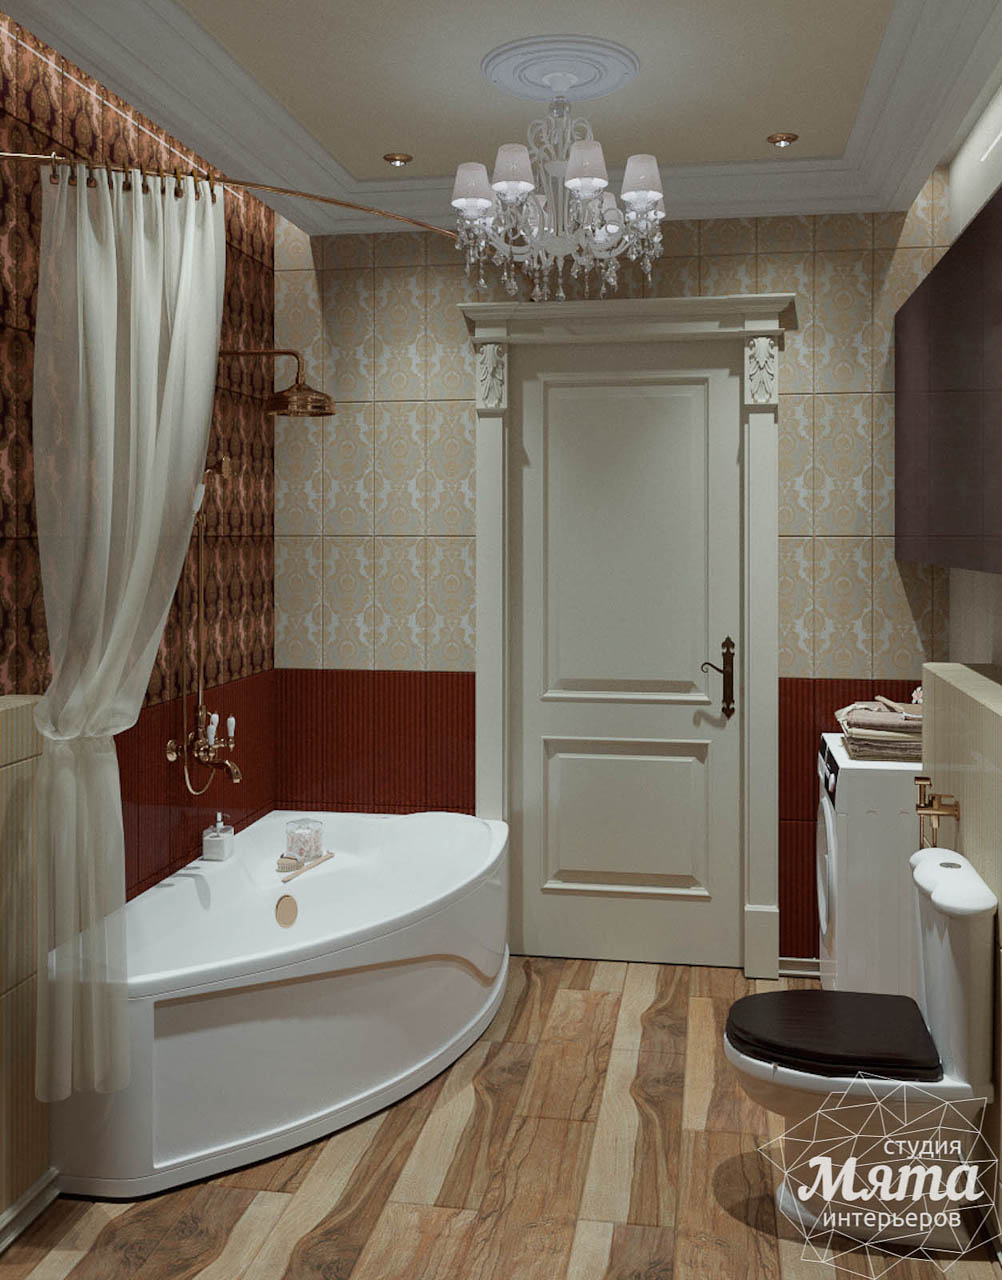 Дизайн интерьера и ремонт трехкомнатной квартиры в Карасьозерском 2 img1851097192